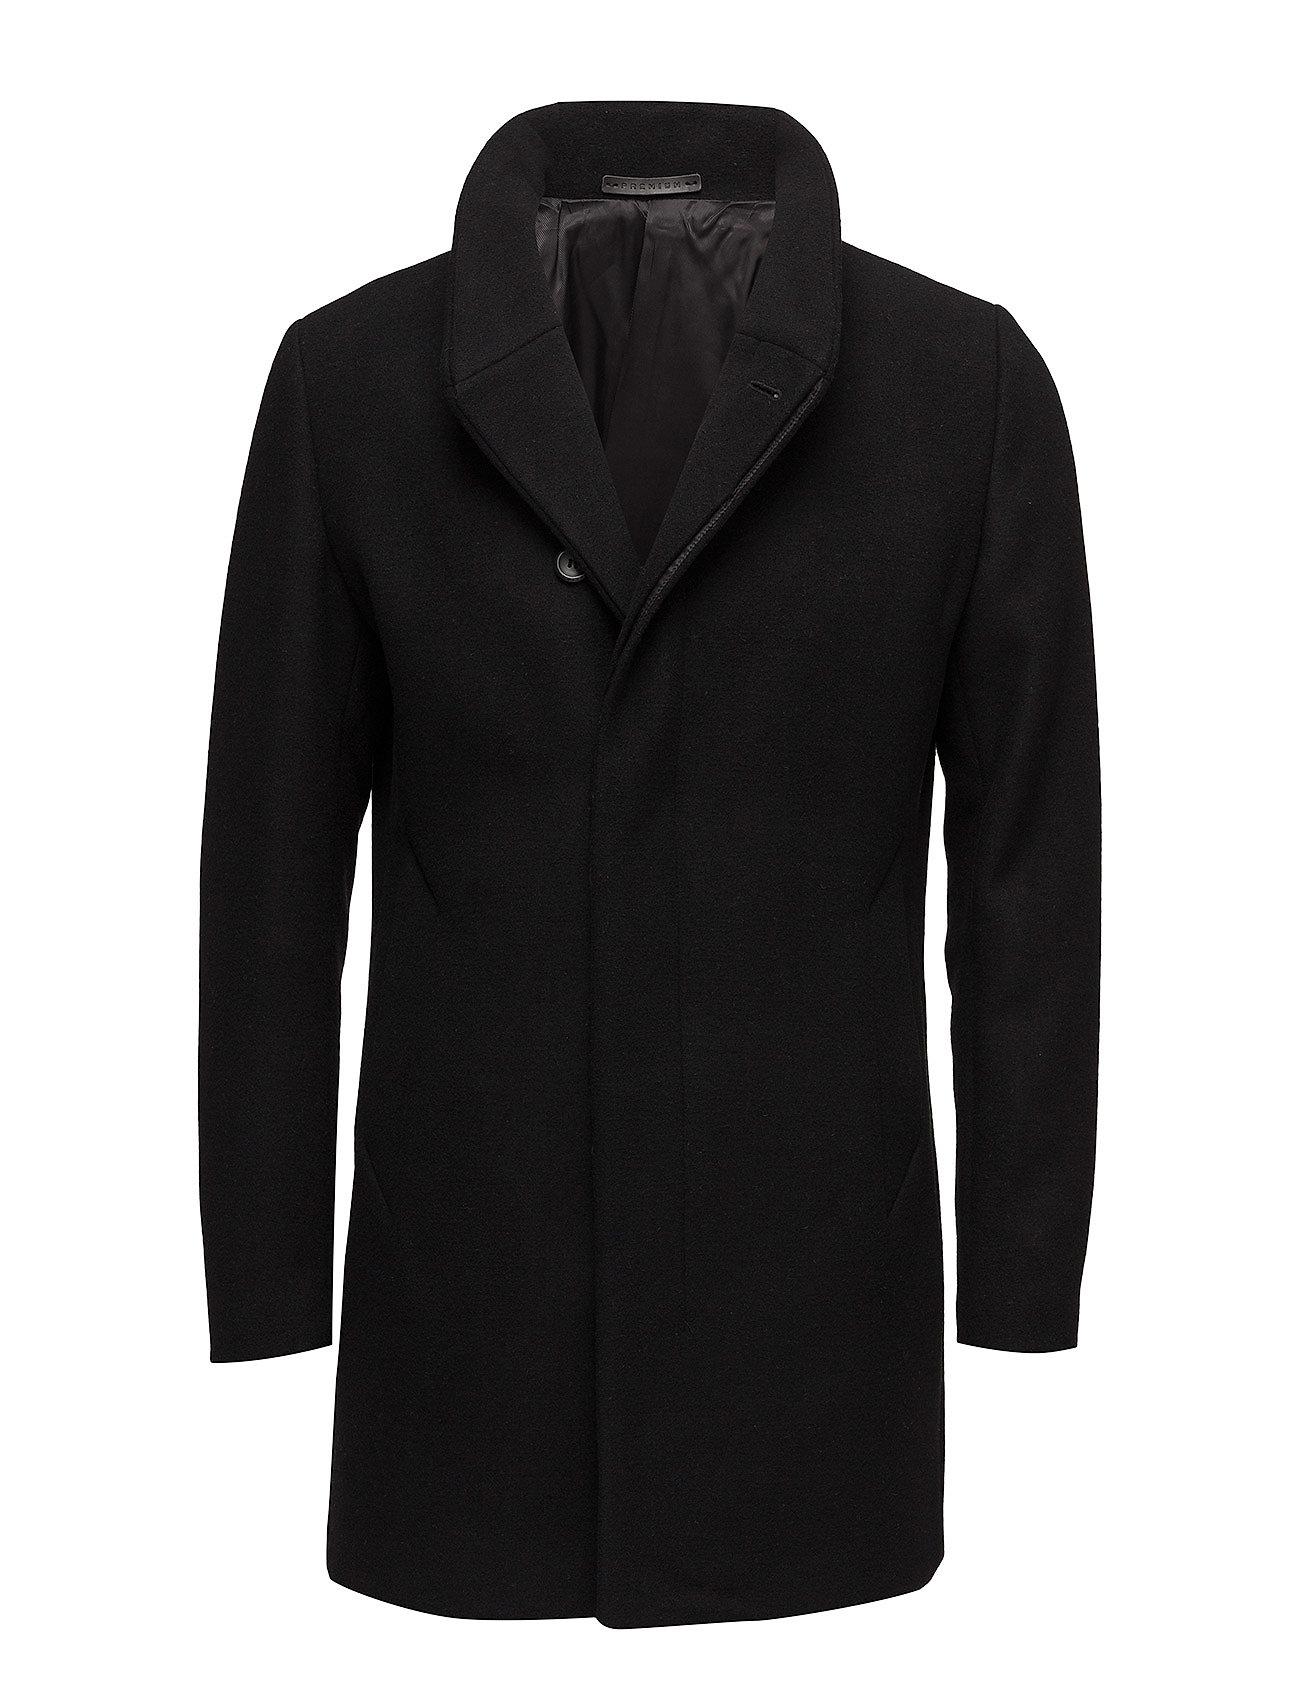 jack & jones premium – Jprgotham wool jacket sts fra boozt.com dk